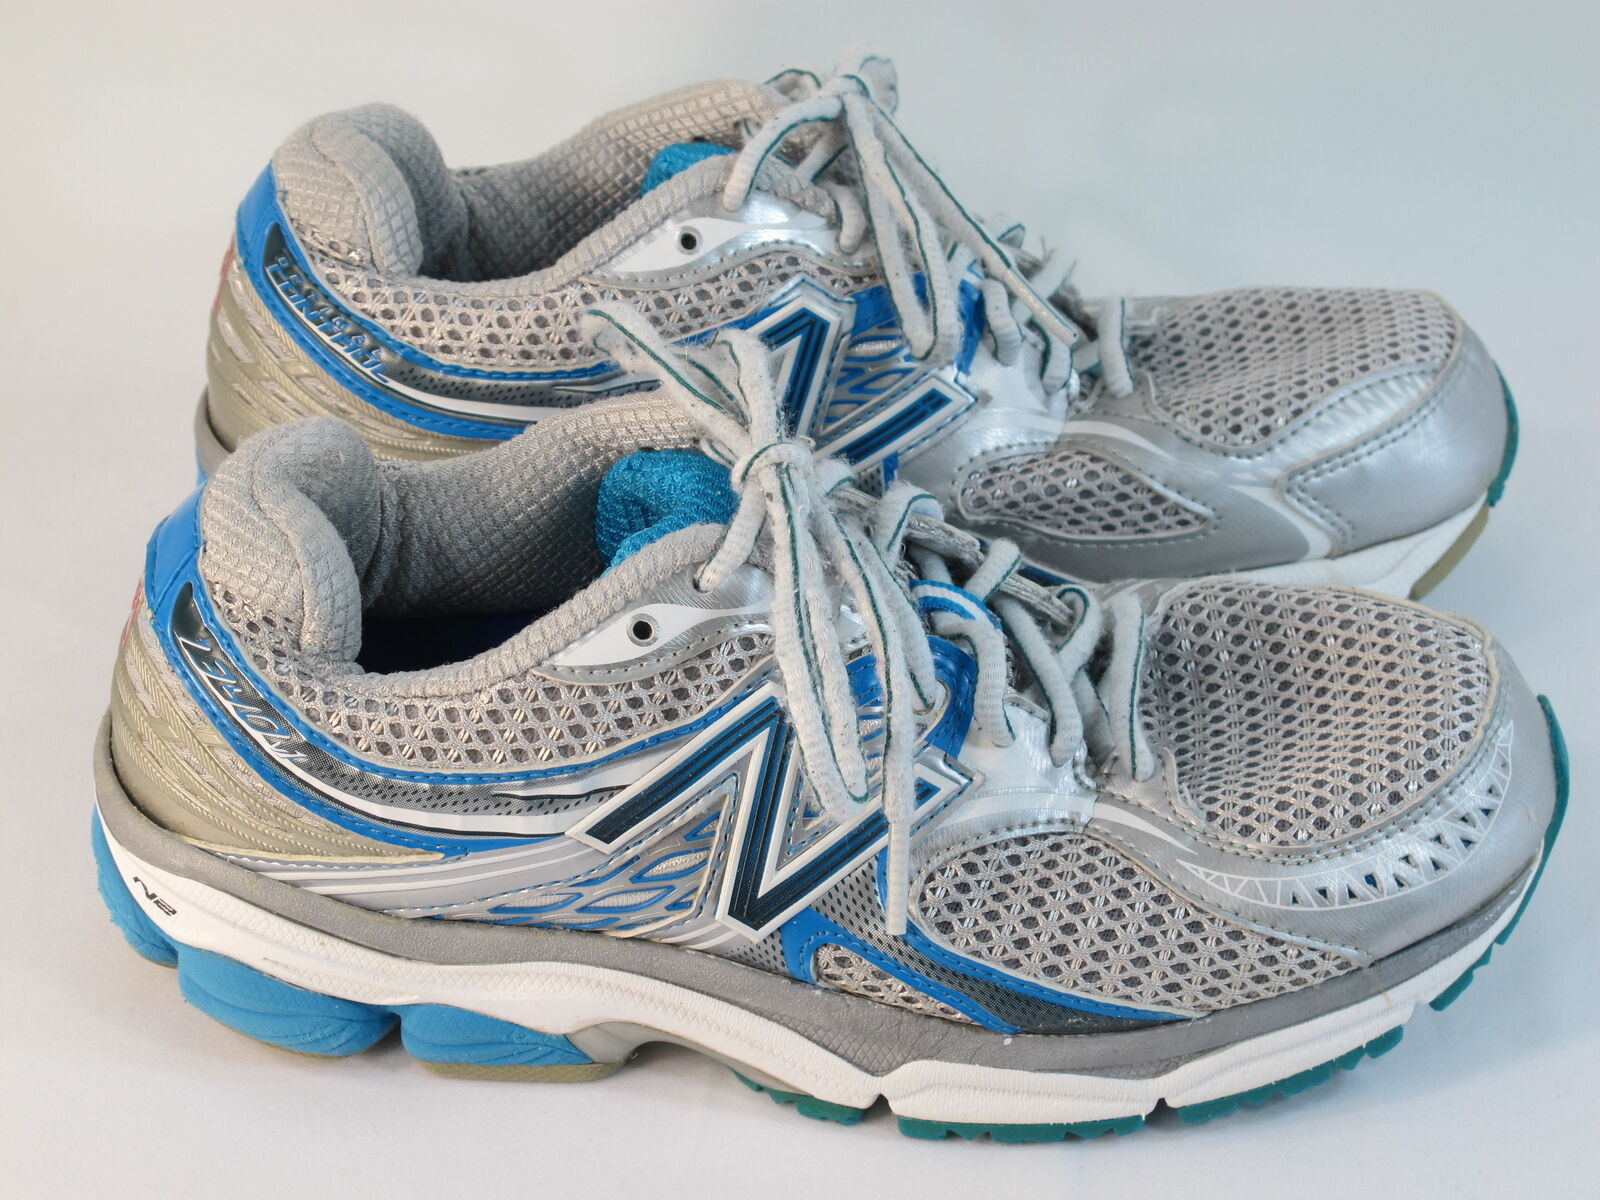 New Balance 1340 Running Shoes Women's 8.5 D US Excellent Plus Condition